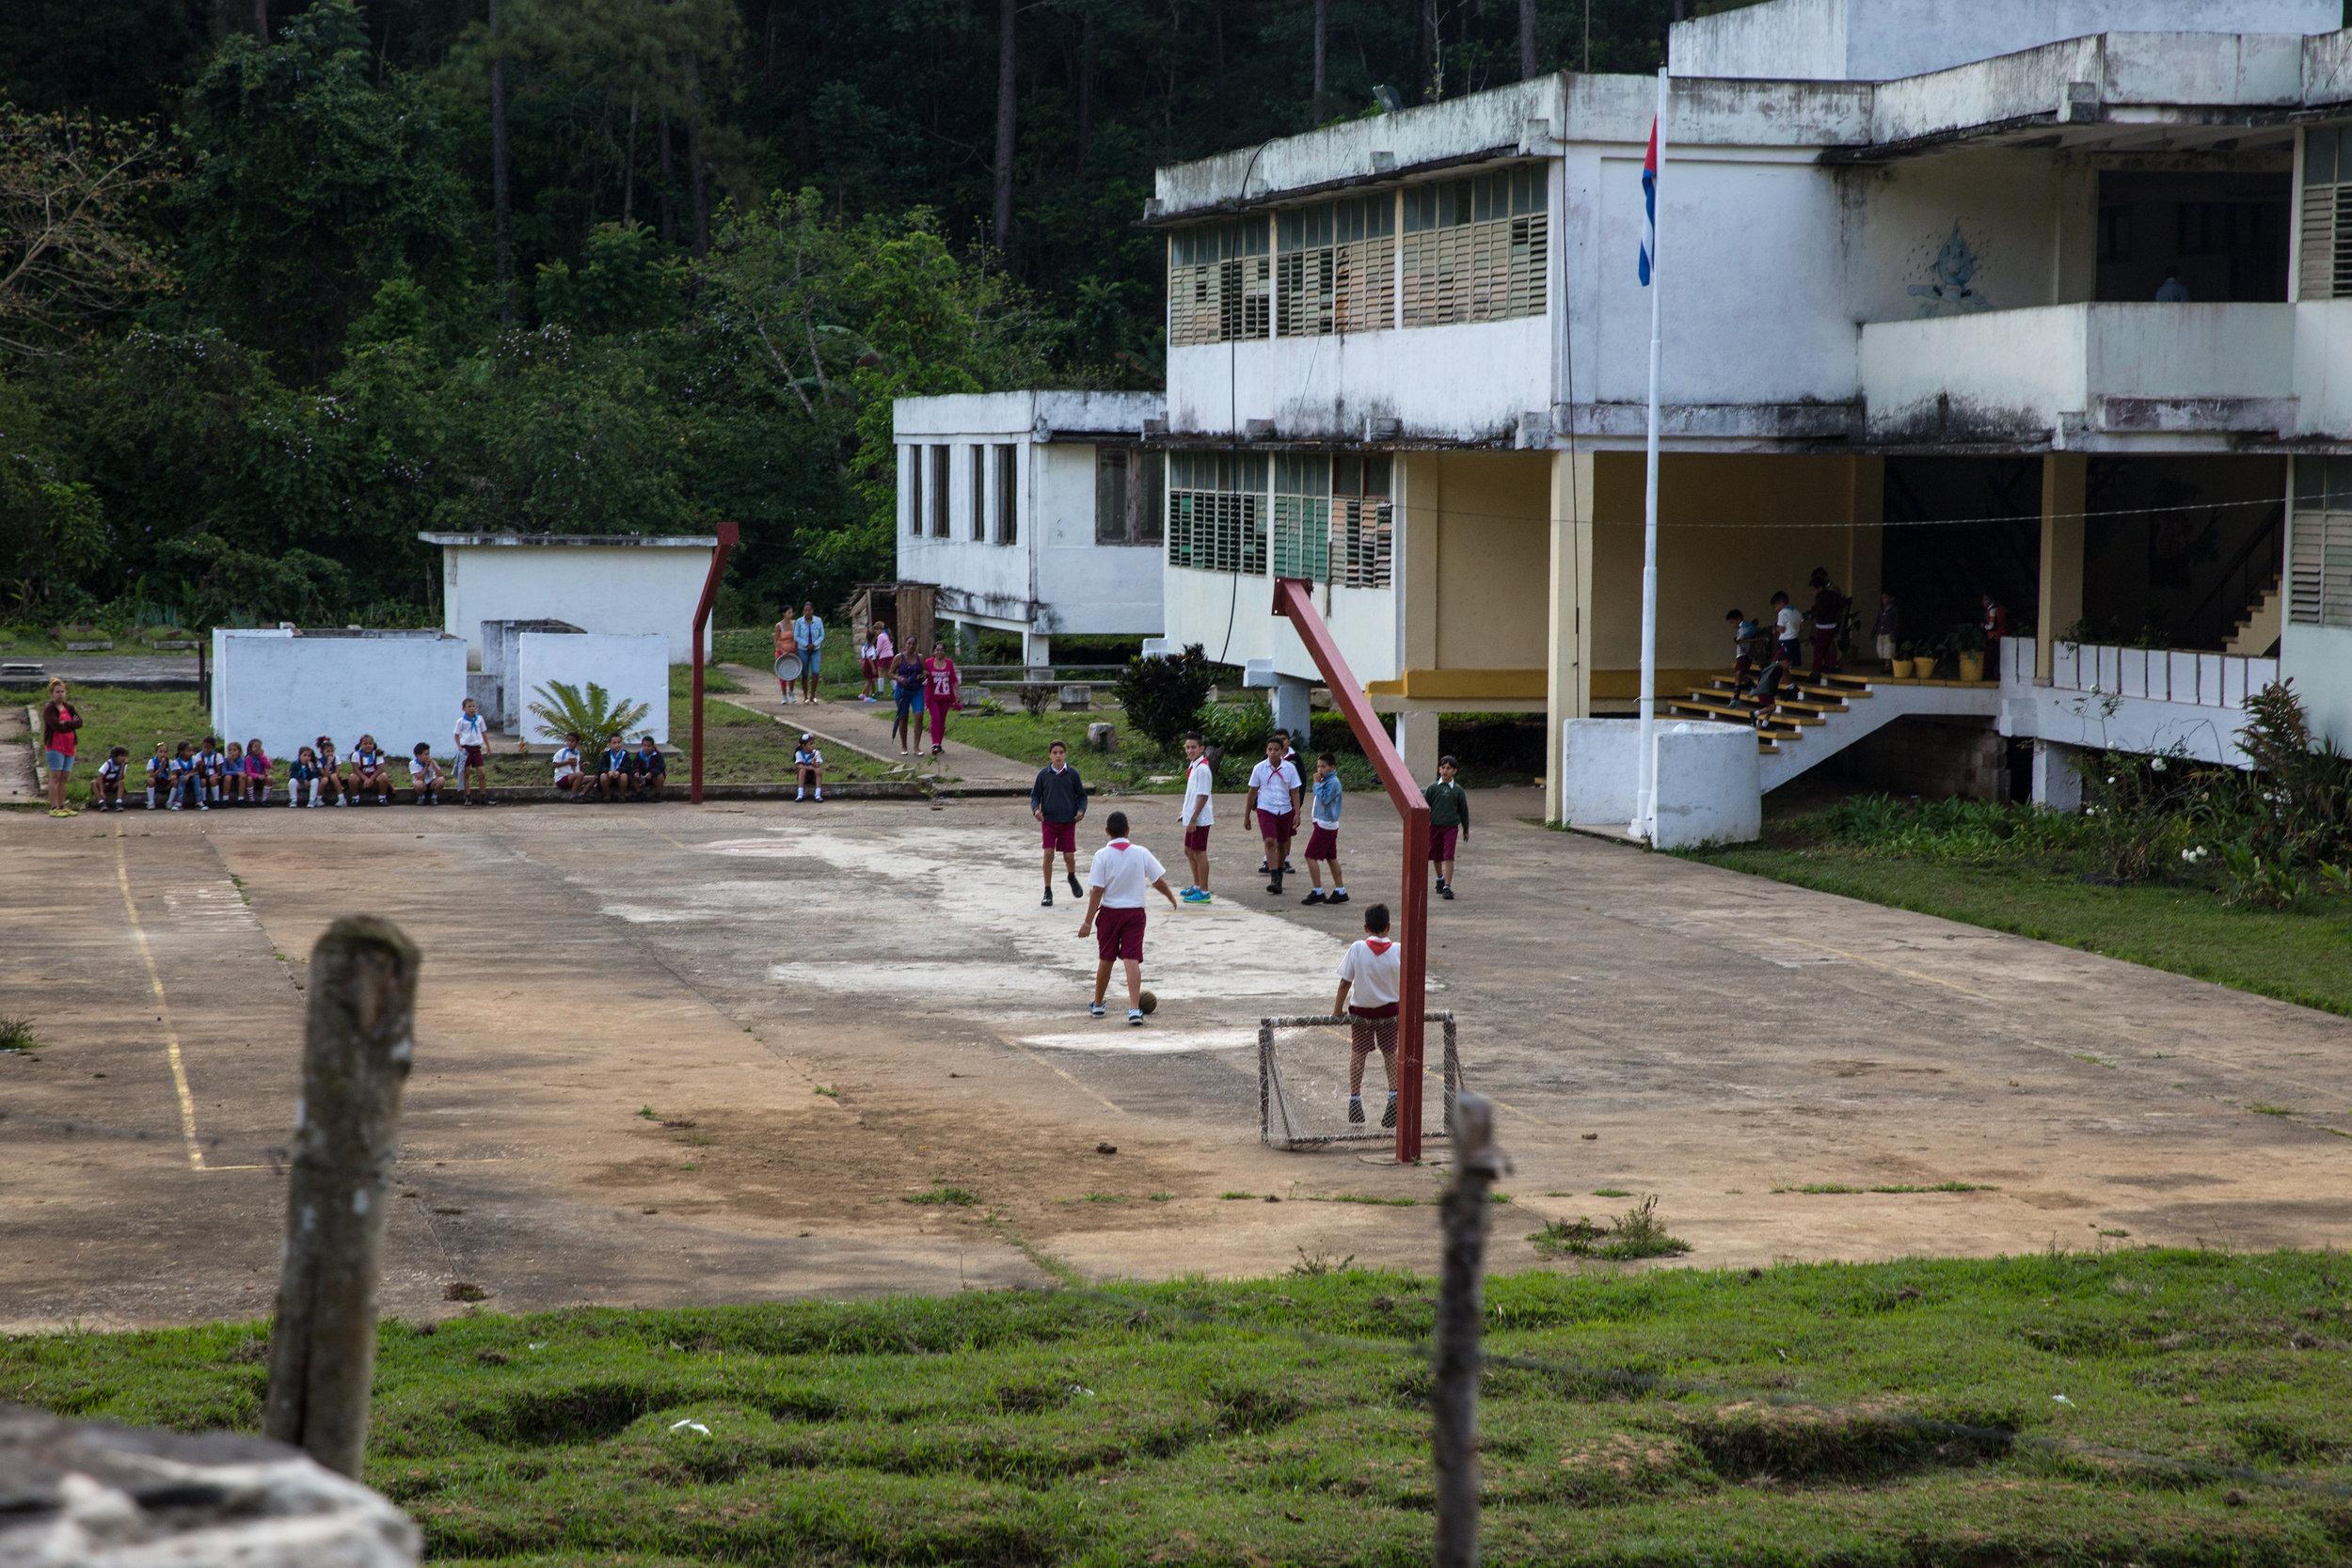 Kids play at school while we trek through the Escambray mountains.